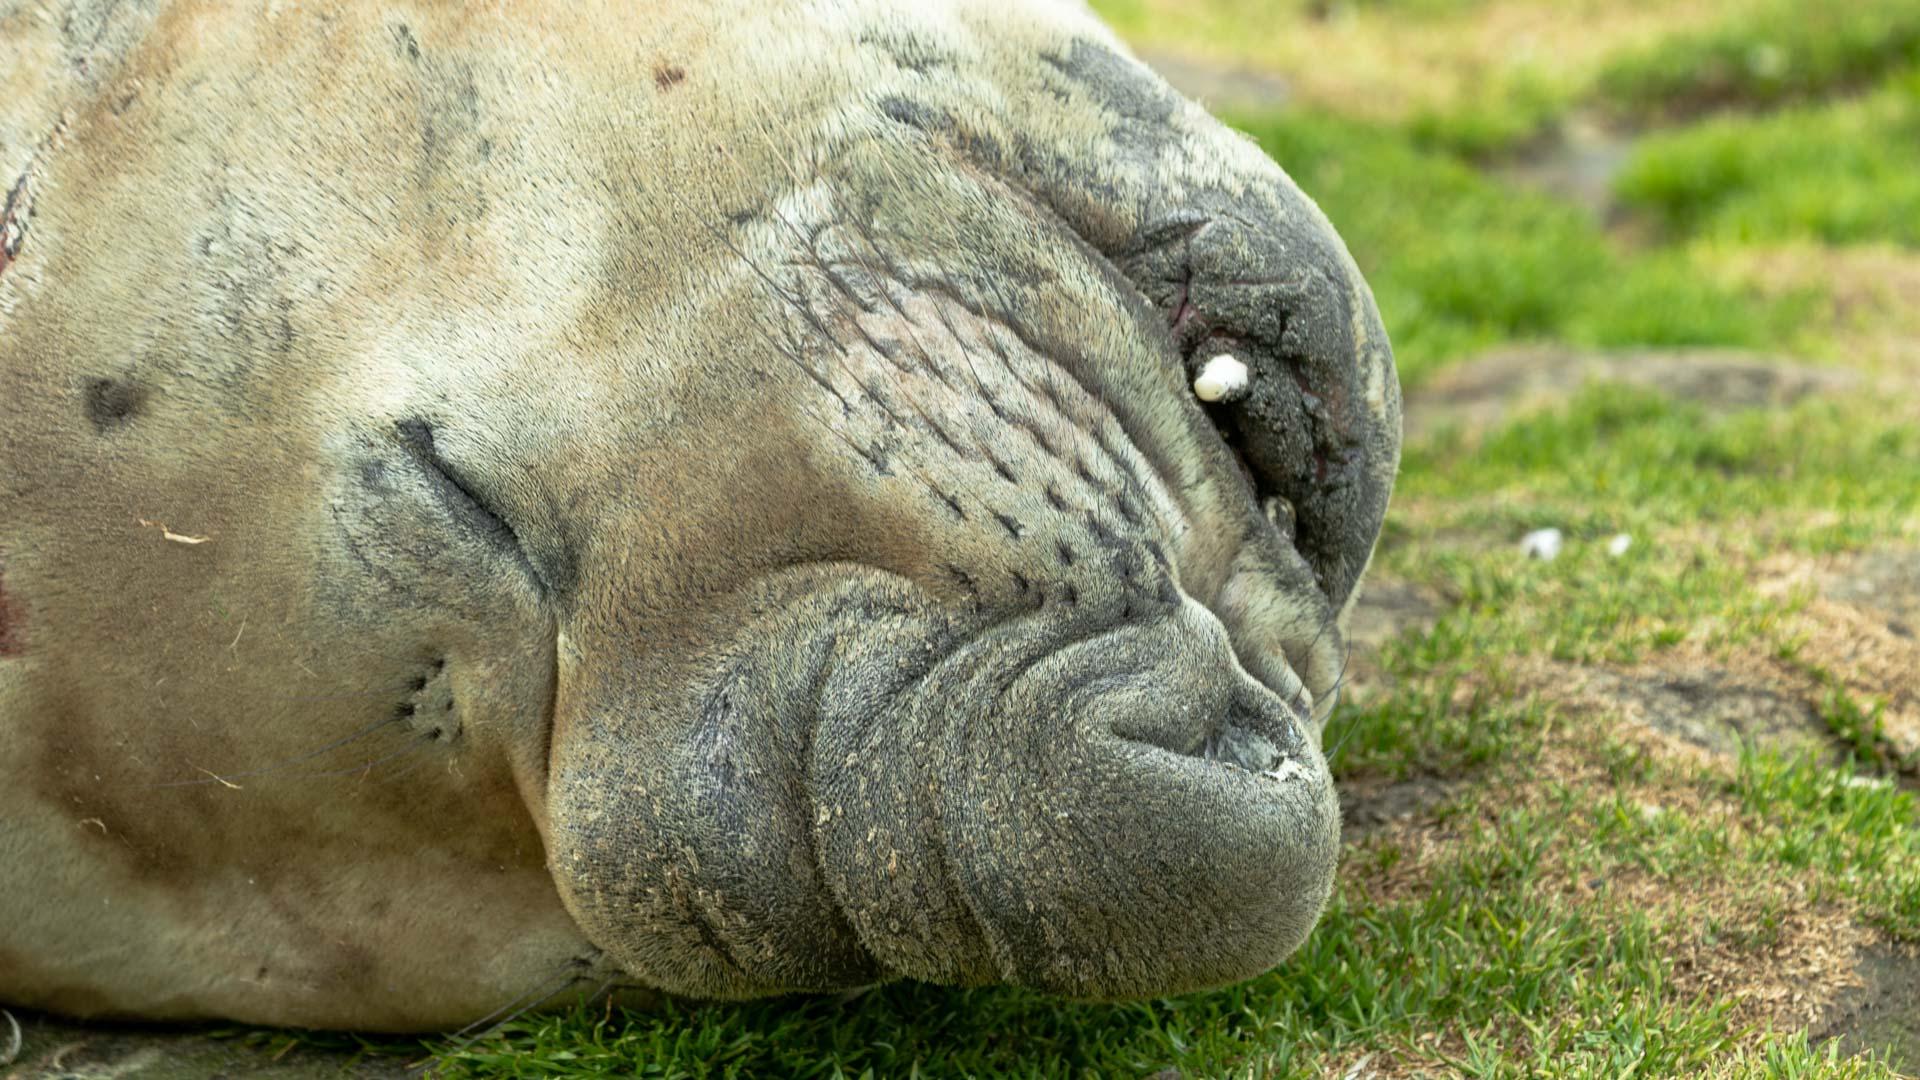 Seelefant, Robbenart, St. Andrews Bay, Südgeorgien